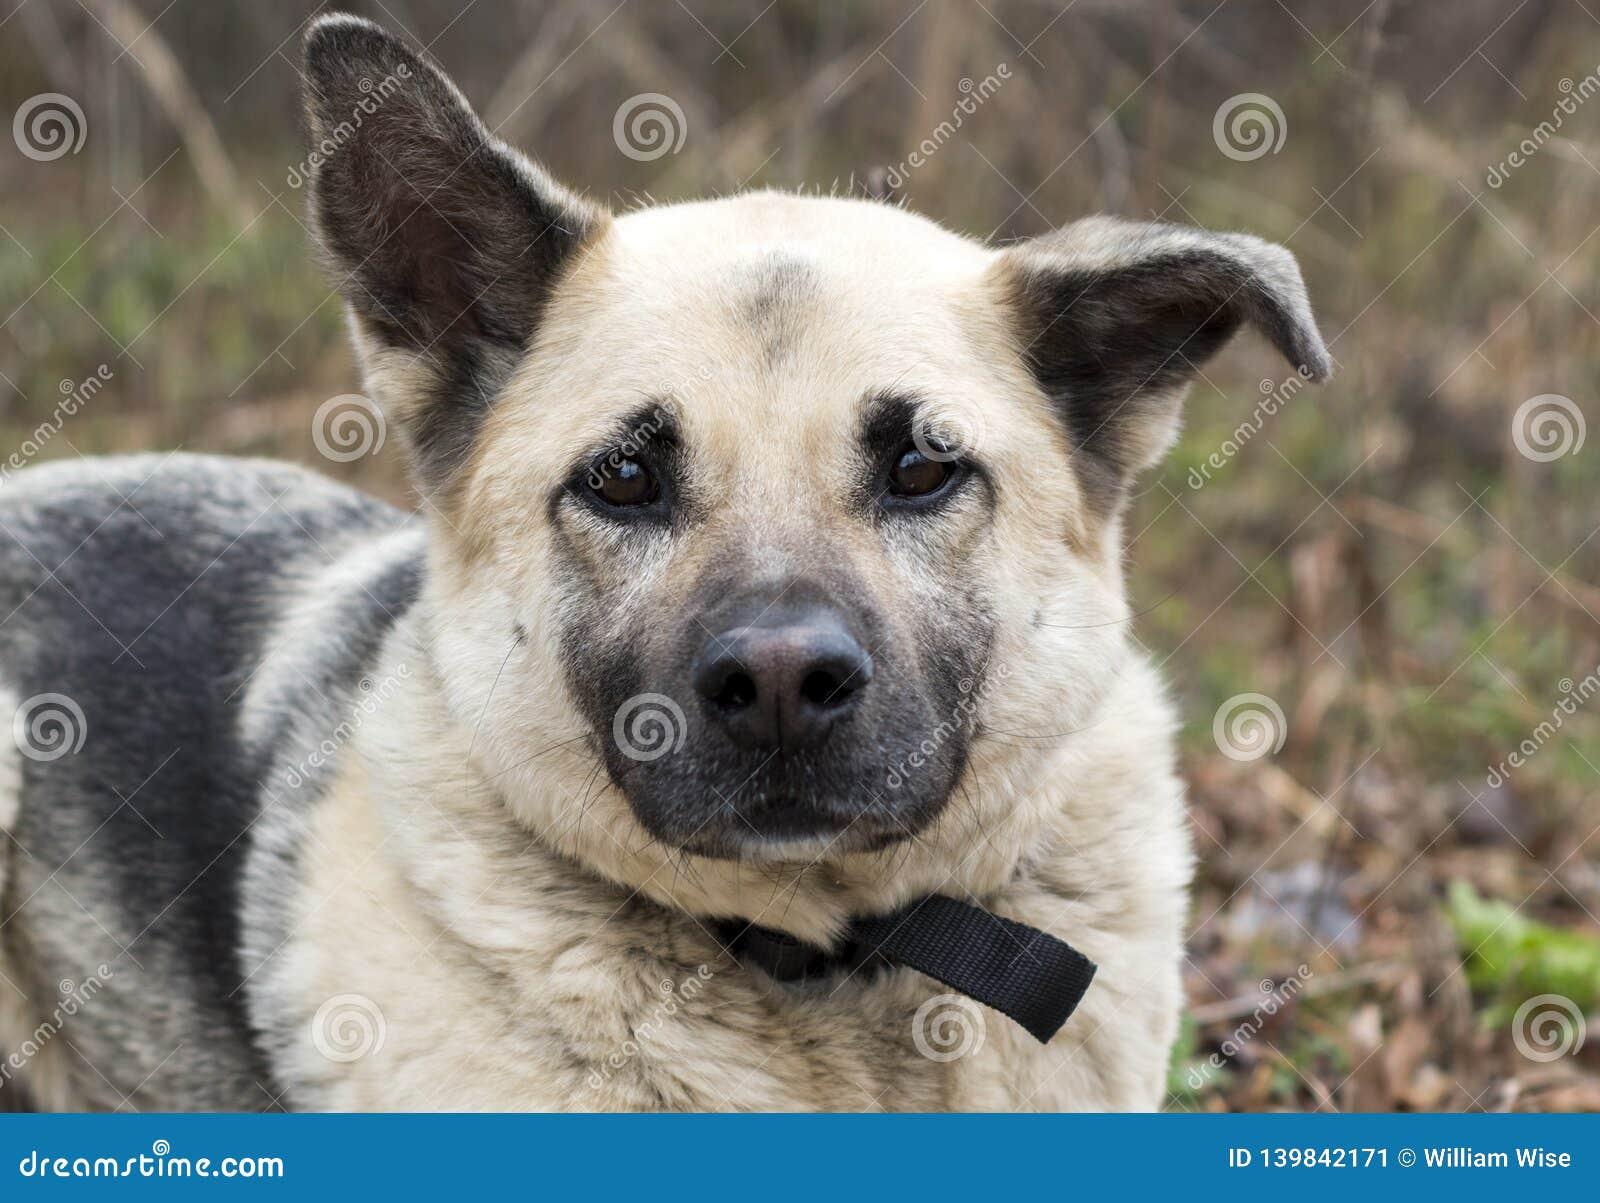 German Shepherd Mixed Breed Dog Adoption Photo Stock Image